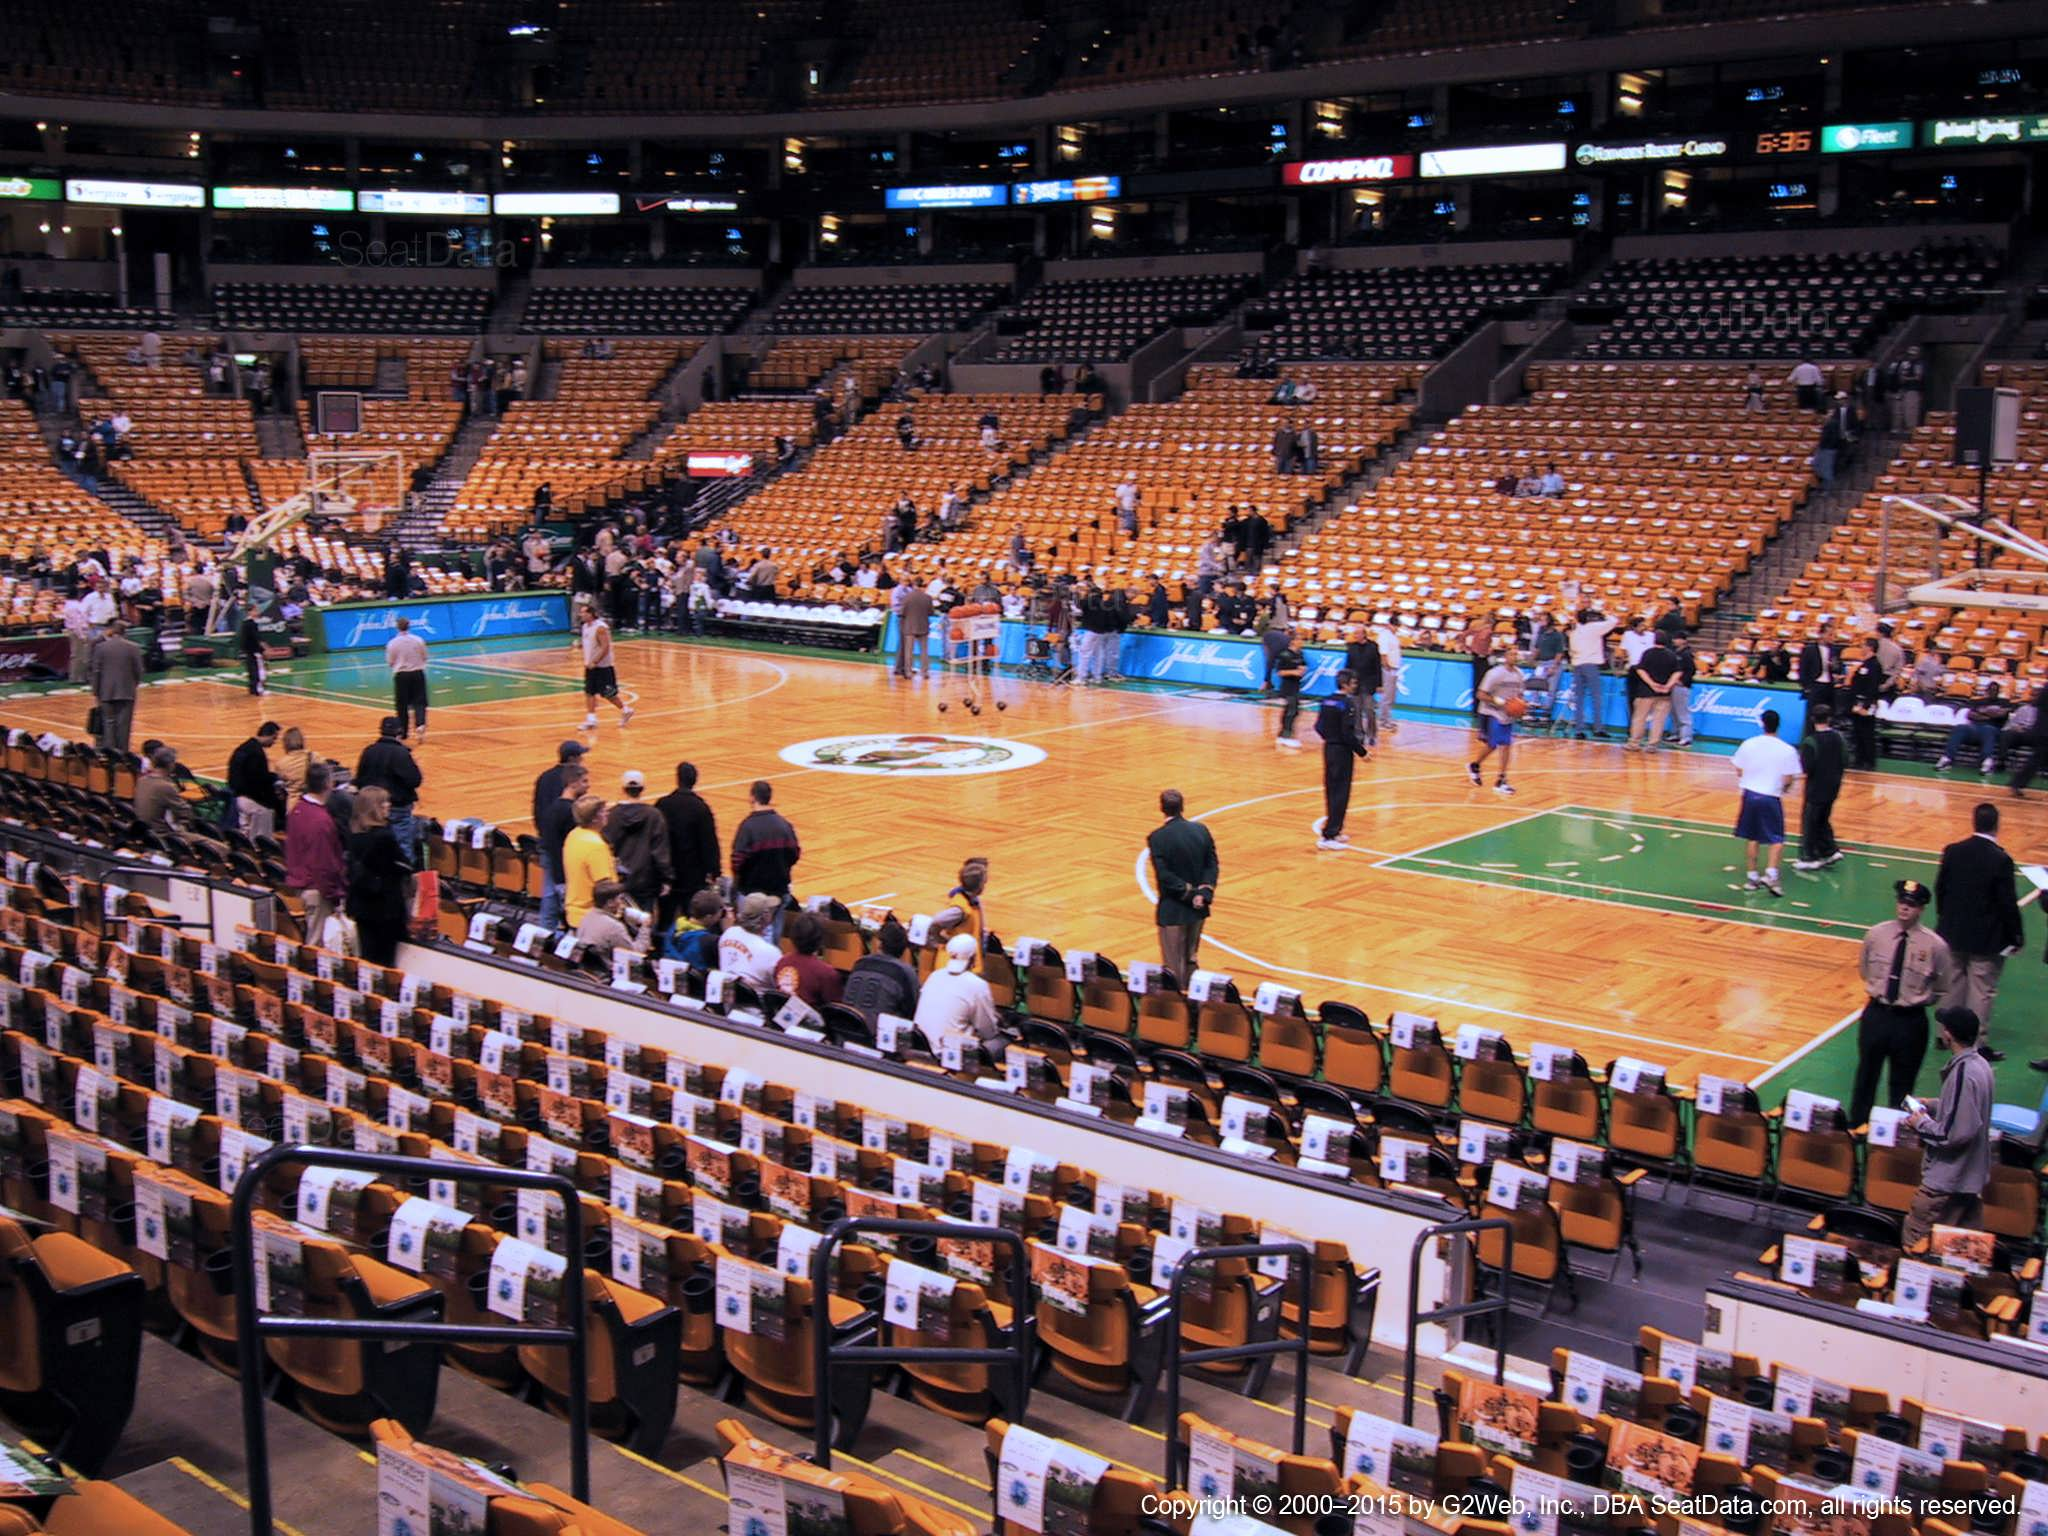 Boston Celtics Seat View for TD Garden Loge 10